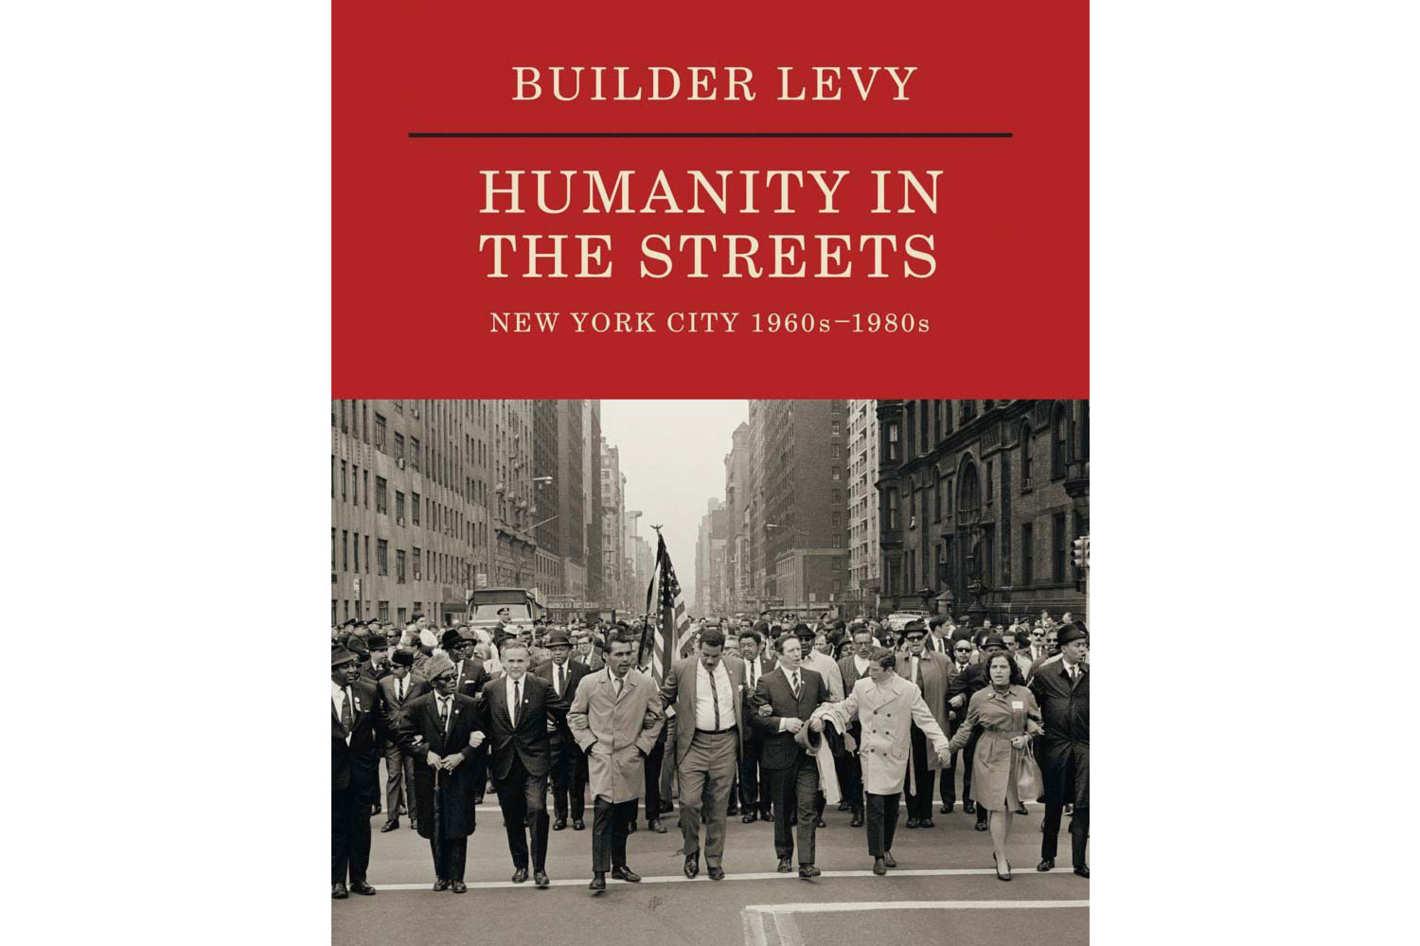 <em>Builder Levy: Humanity in the Streets</em>